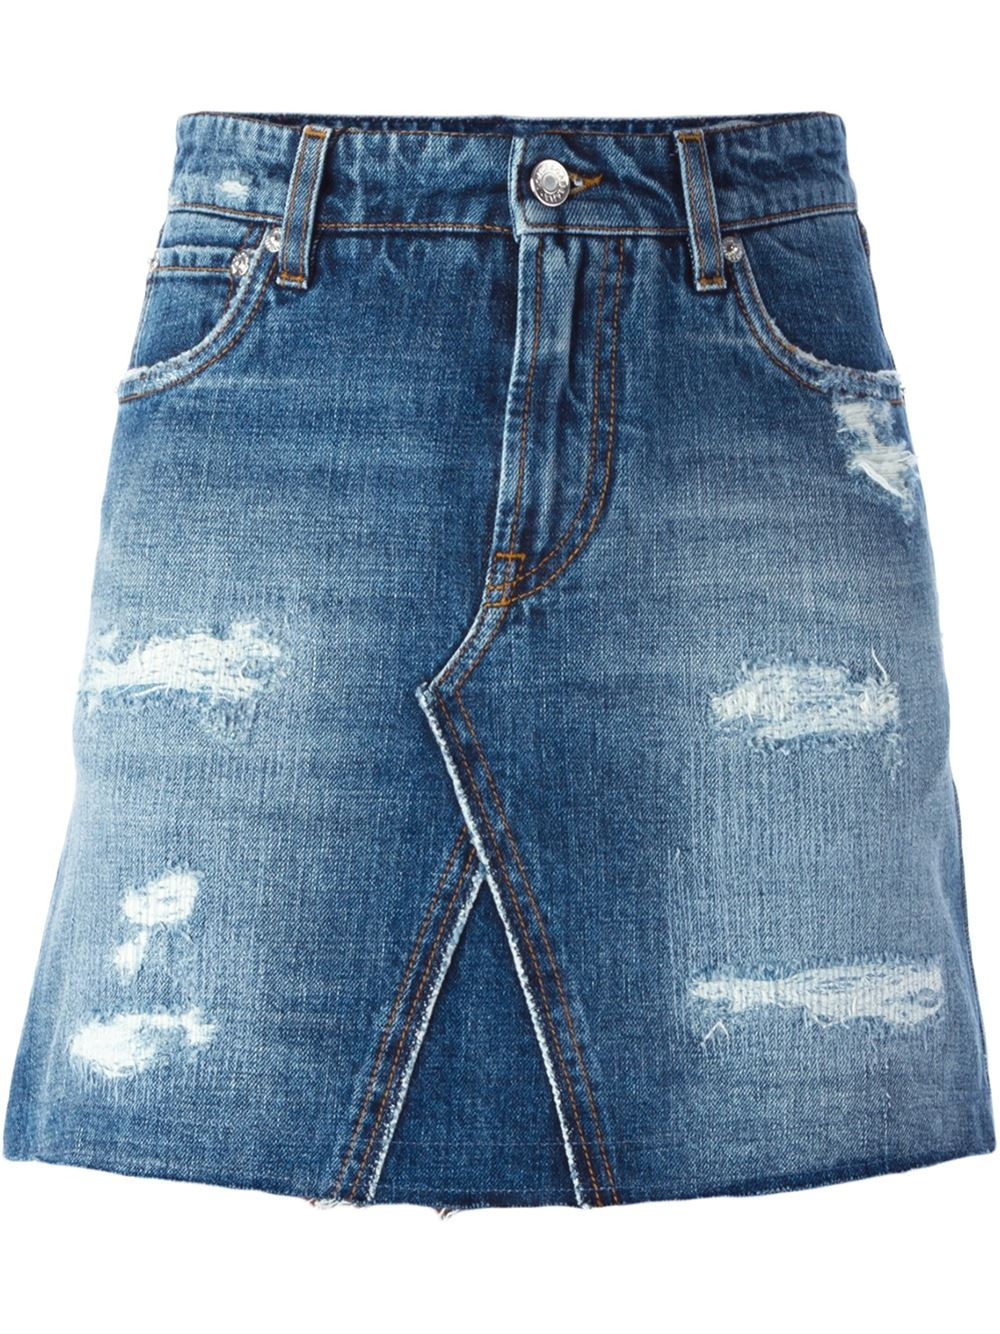 dolce gabbana ripped denim skirt in blue lyst